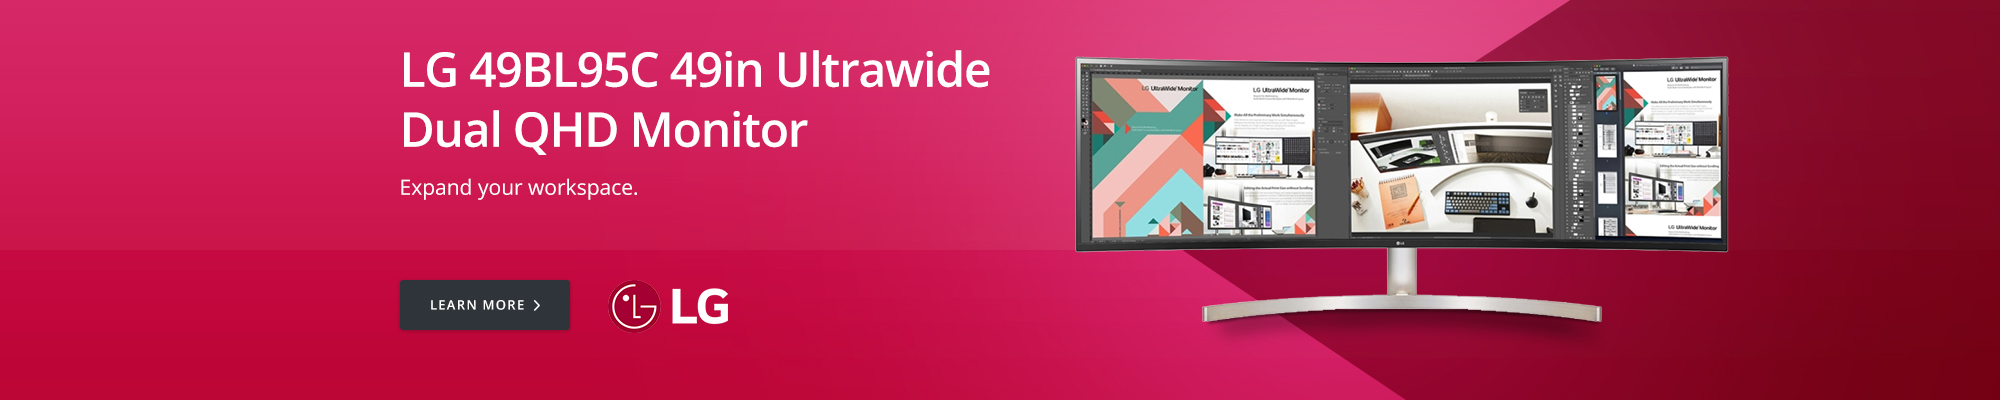 LG 49BL95C 49in Ultrawide Dual QHD Monitor